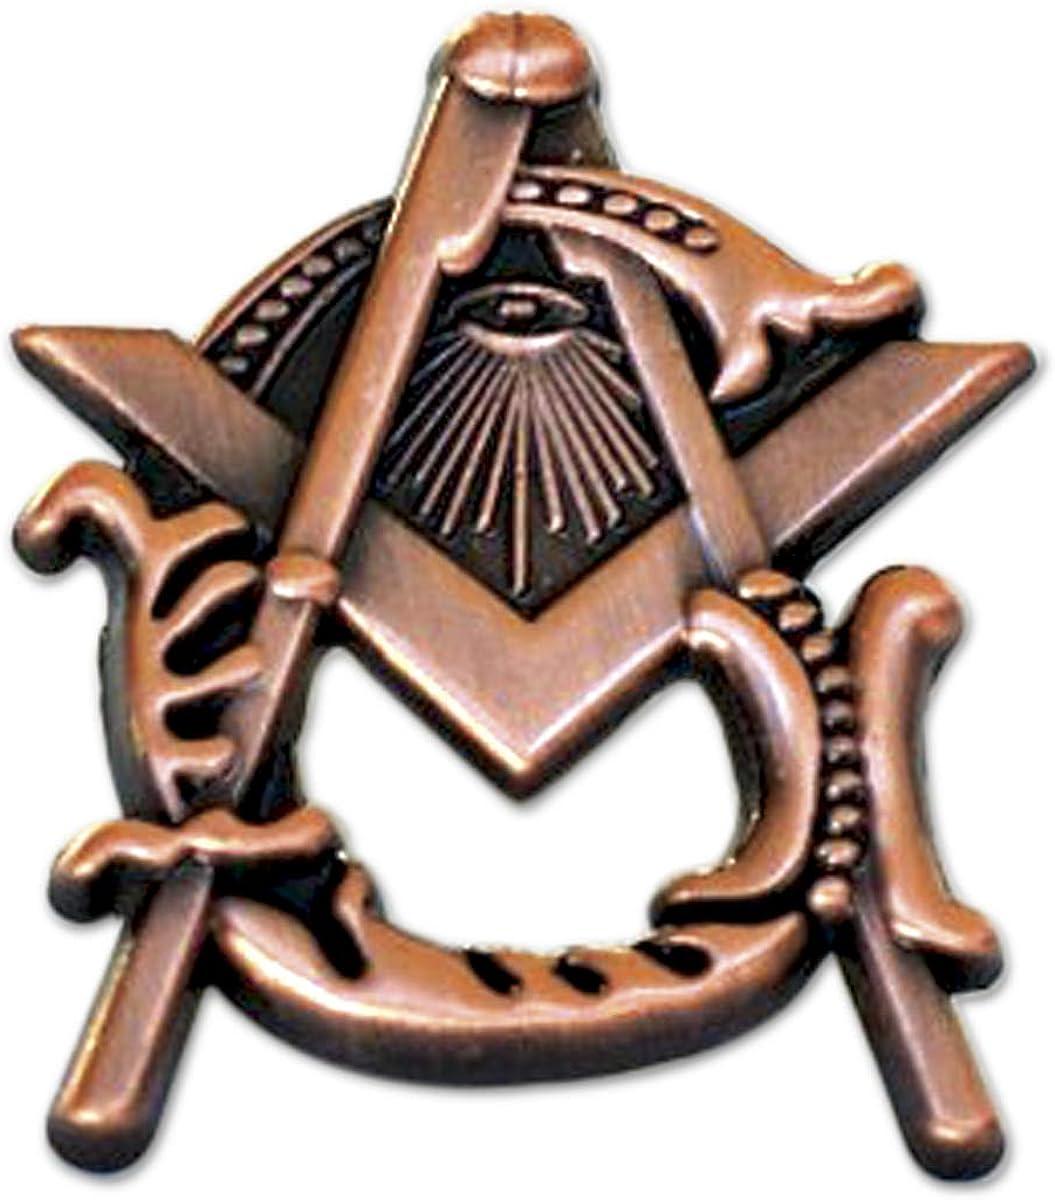 Square Compass Ultra-Cheap Deals Masonic Lapel Pin Antique Tall 1'' - Copper 5 ☆ very popular